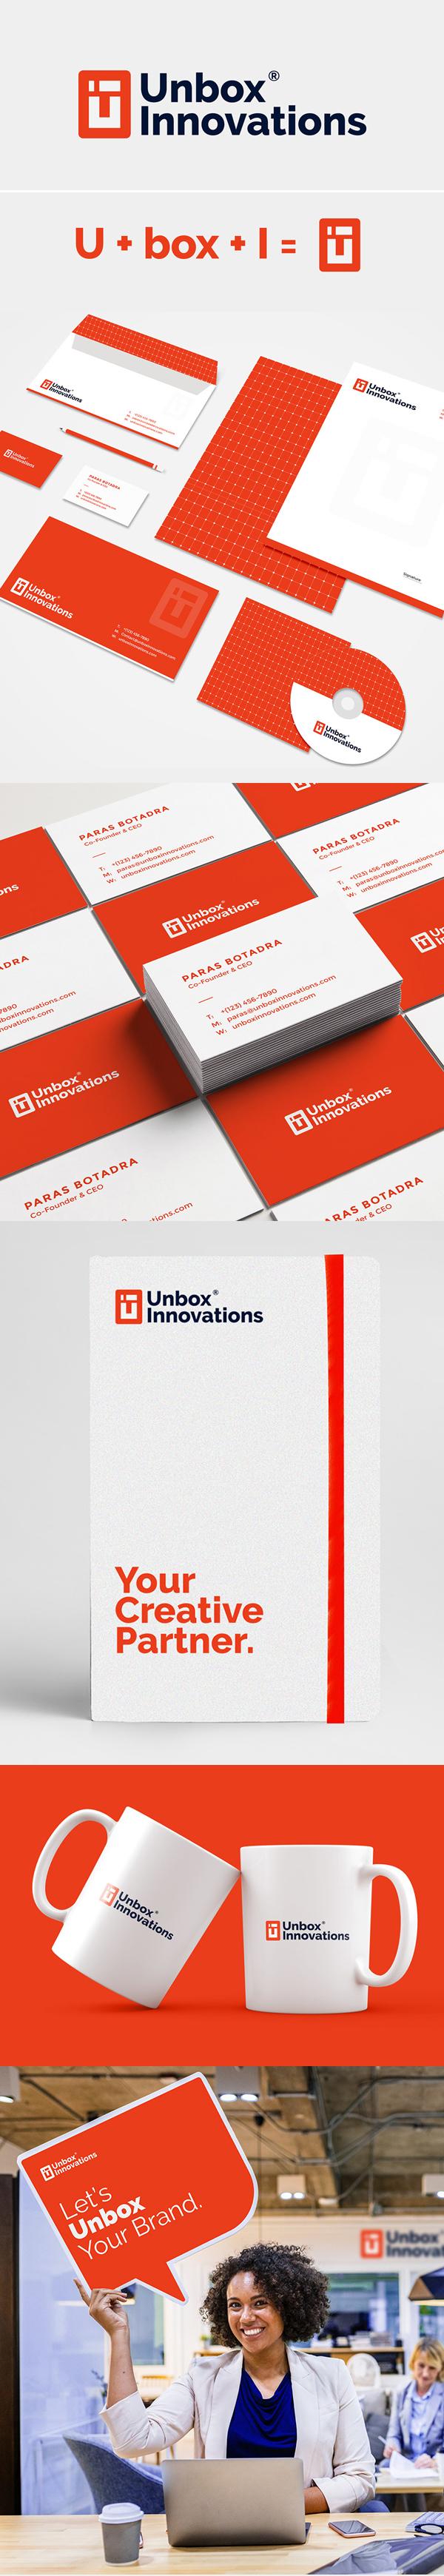 Branding: Unbox Innovations Logo design and Branding by Kanhaiya Sharma